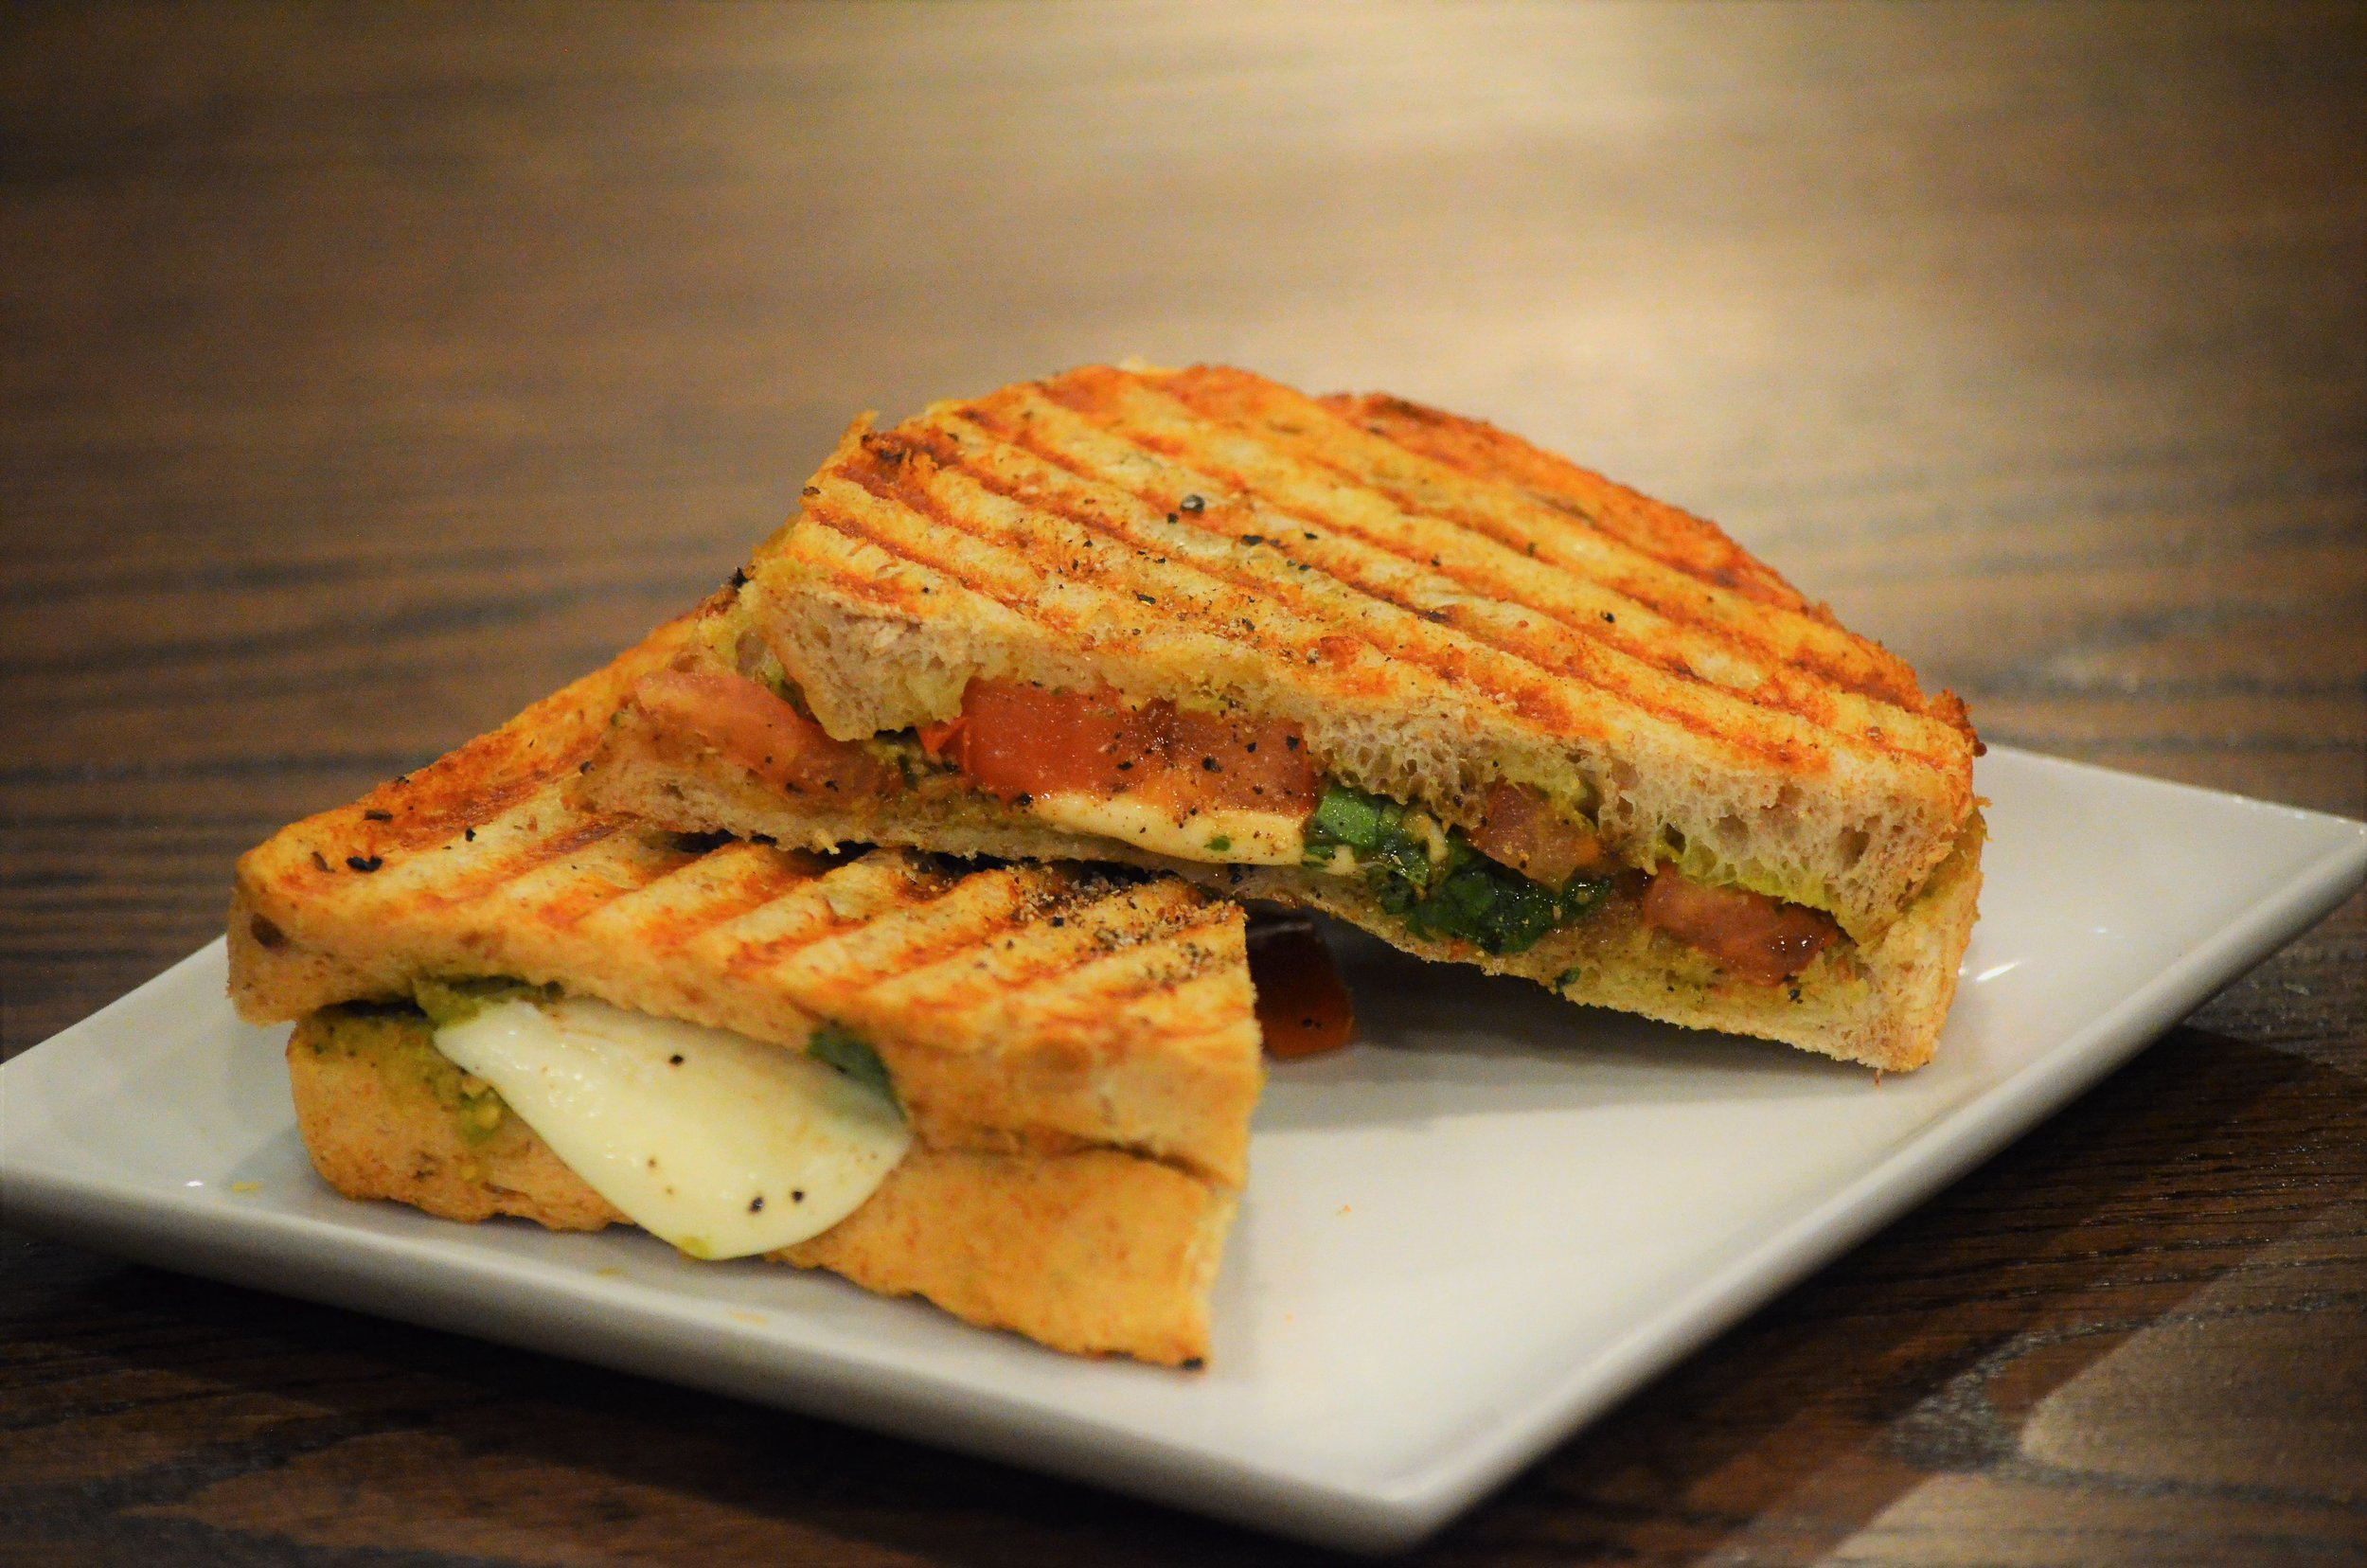 Food Detail - Grilled Sandwich #2.jpg